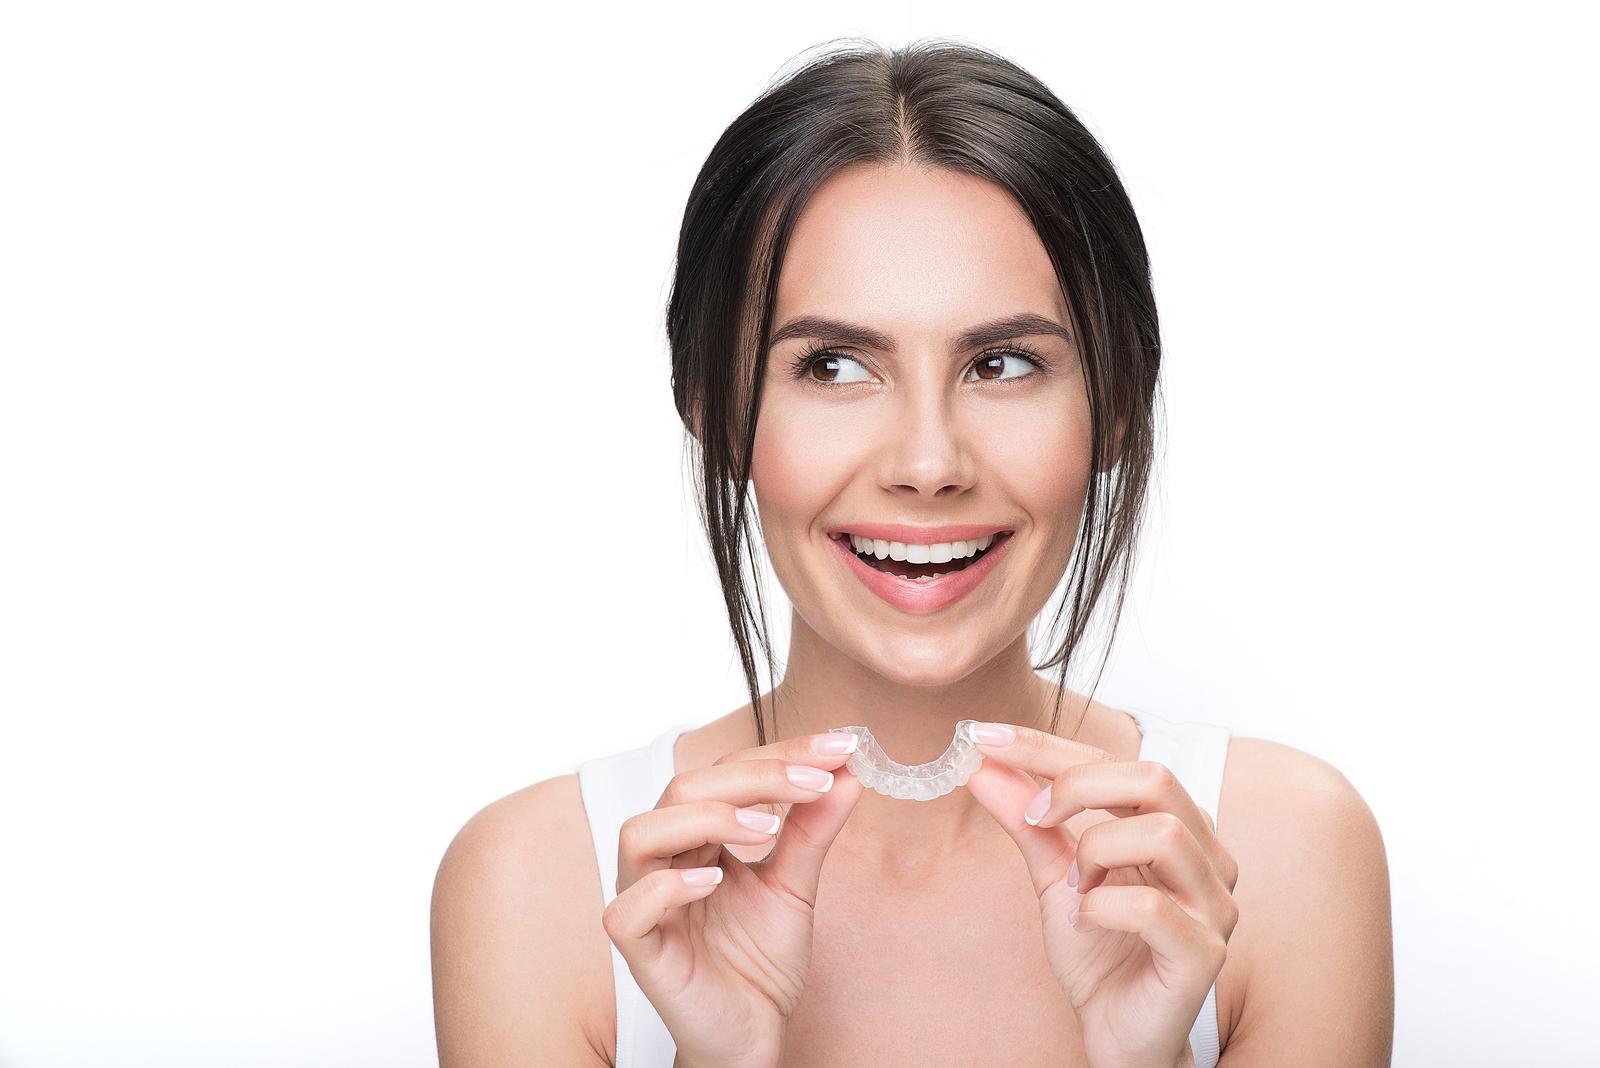 Combine Teeth Whitening and Invisalign in Dublin, CA